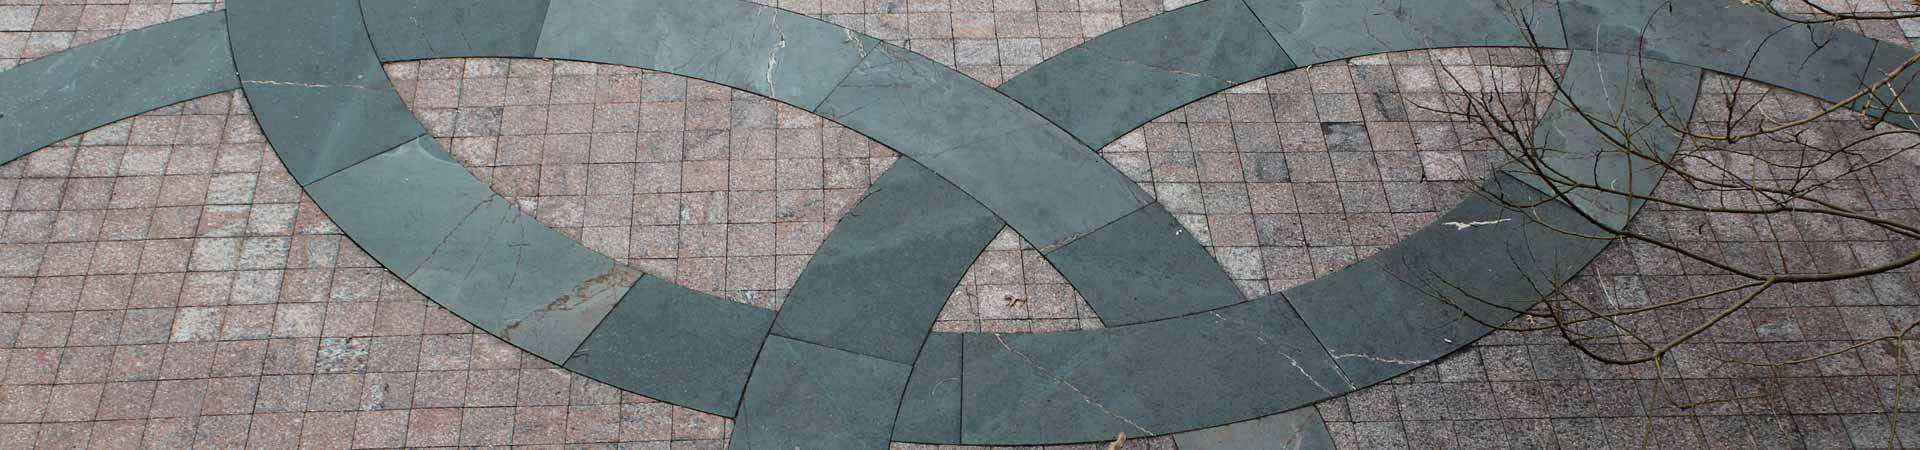 STM-Banner-Image-Template-piazzarev.jpg